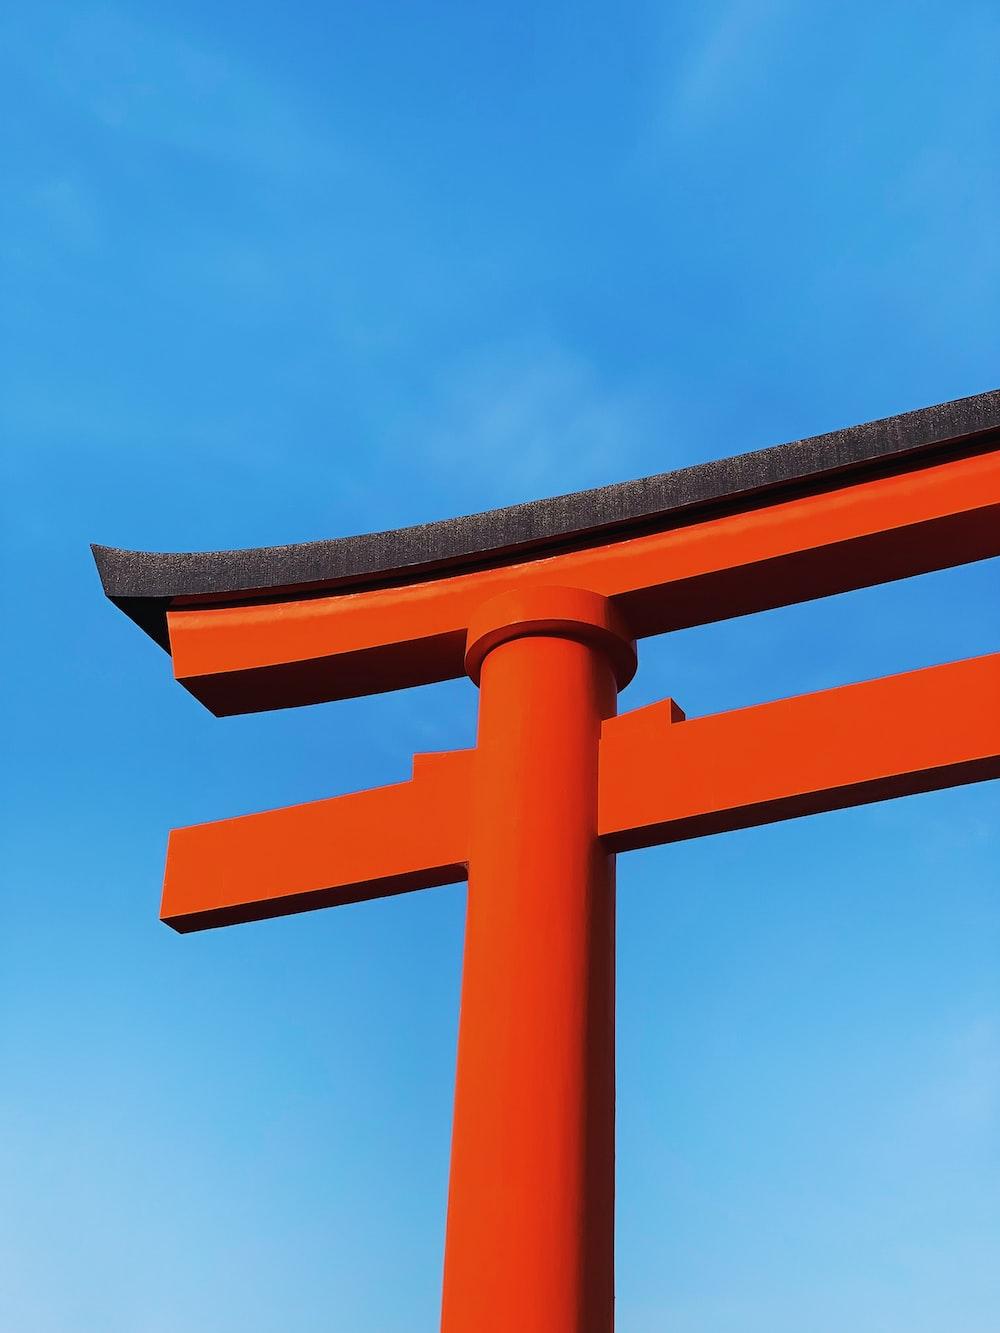 orange and black cross under blue sky during daytime